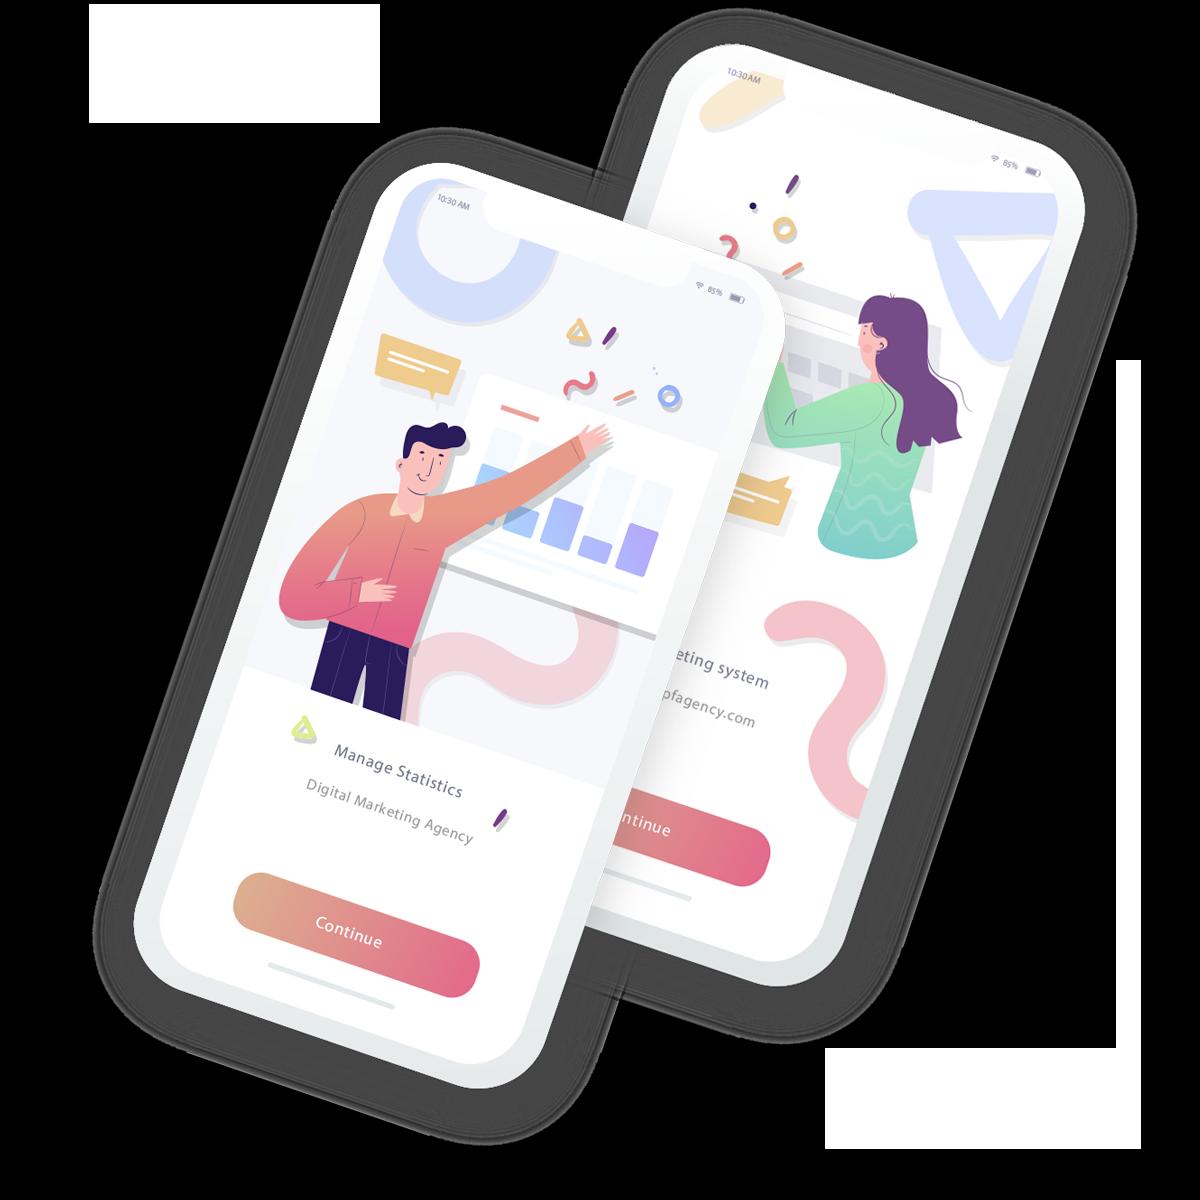 Google companie business developpement 2